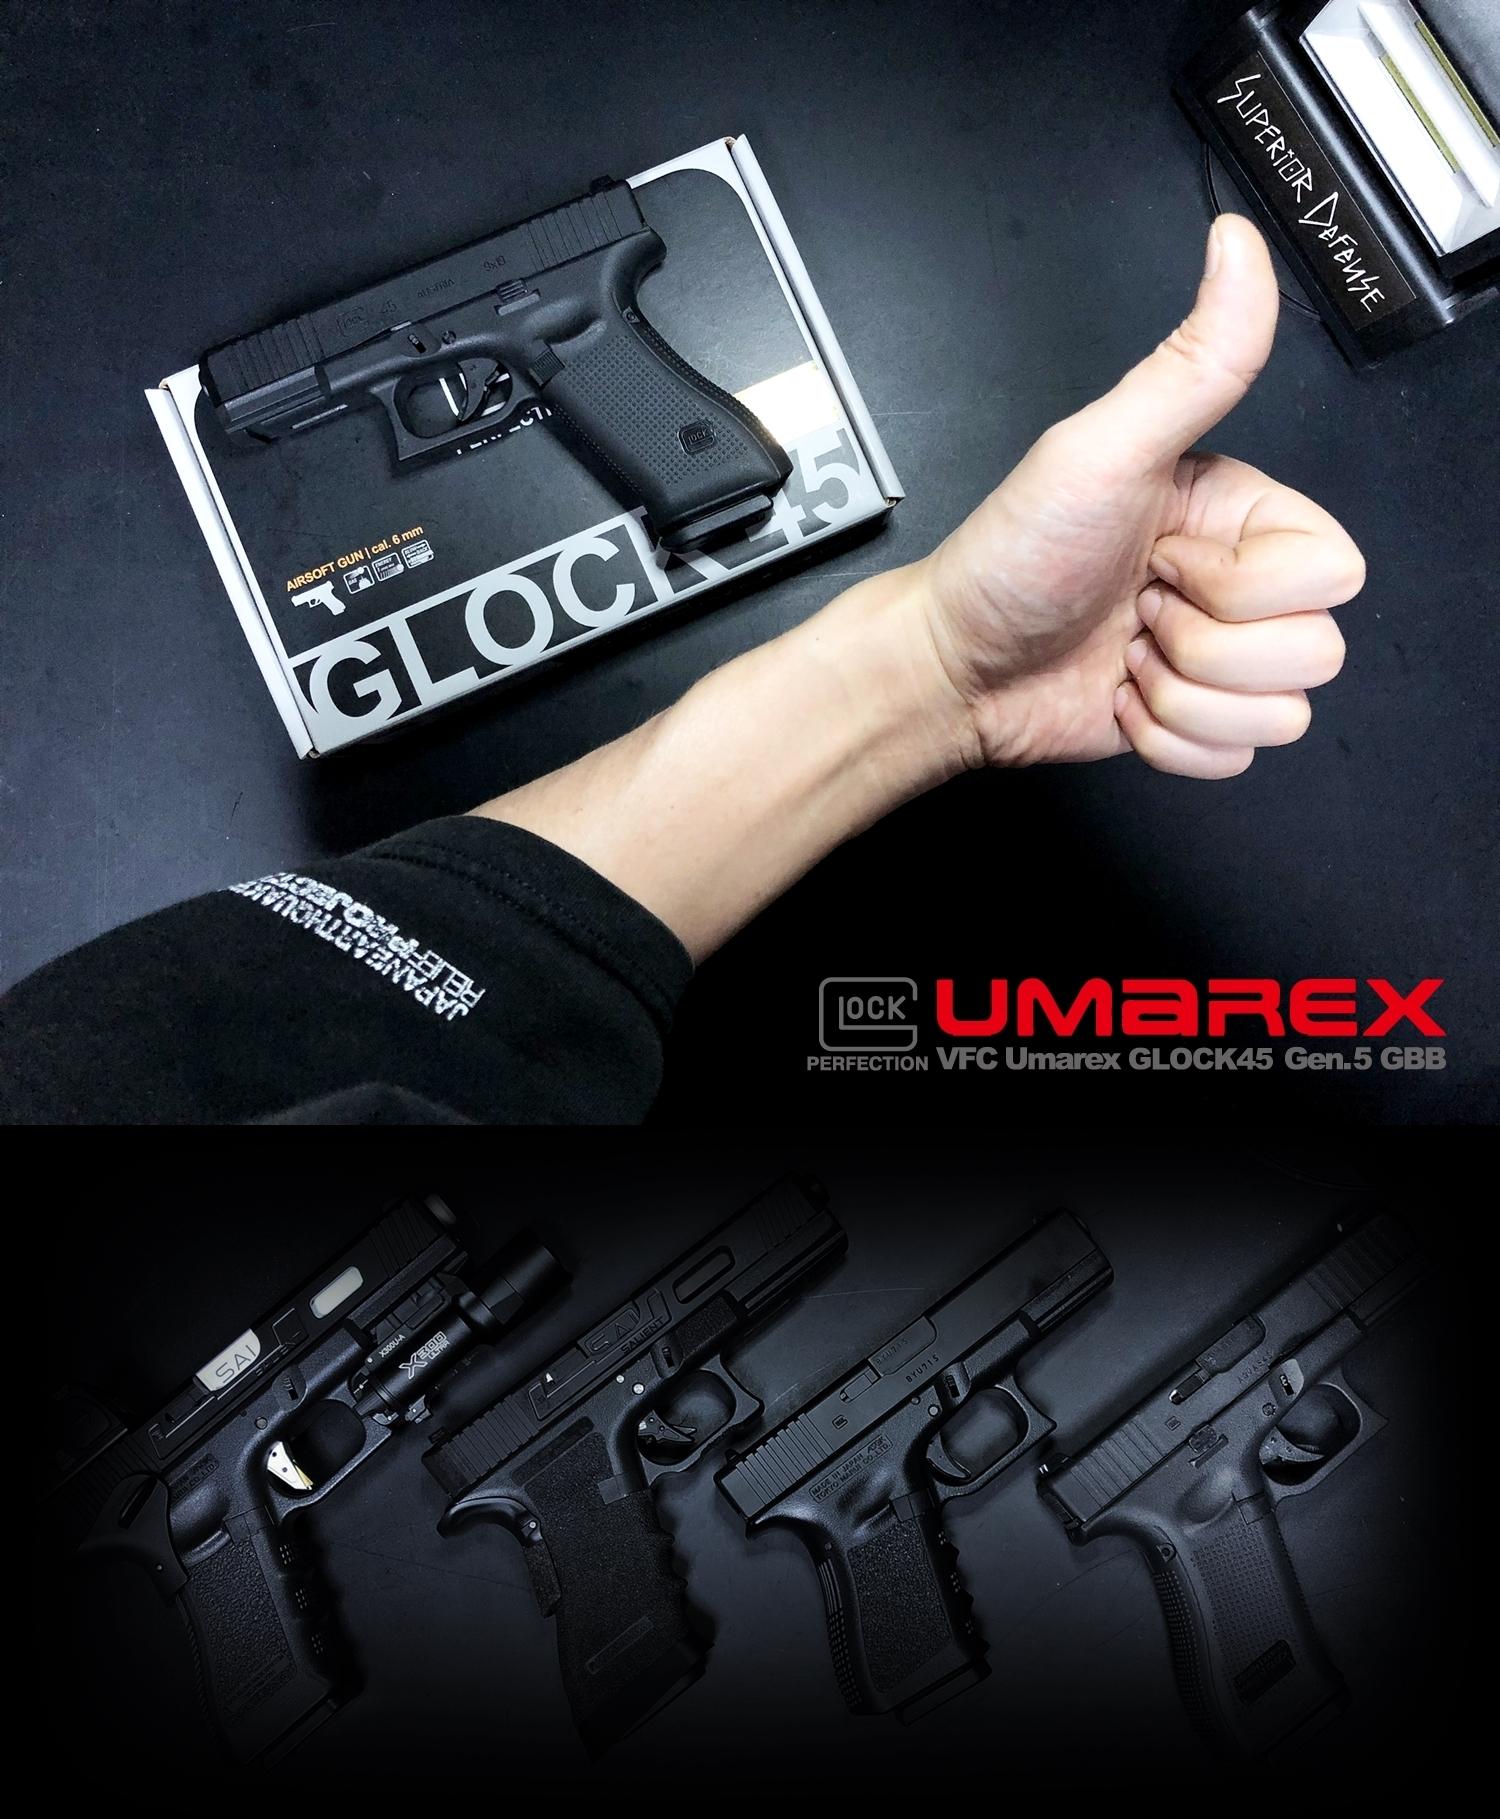 20 UMAREX VFC GLOCK G45 GBB AIRSOFT!! 噂のウマレックス G45 グロック ガスブローバック!! やっと我が家へ着弾 ~ 新品箱出し編!! 購入 開封 初速 計測 検証 比較 通常分解 組立 カスタム レビュー!!